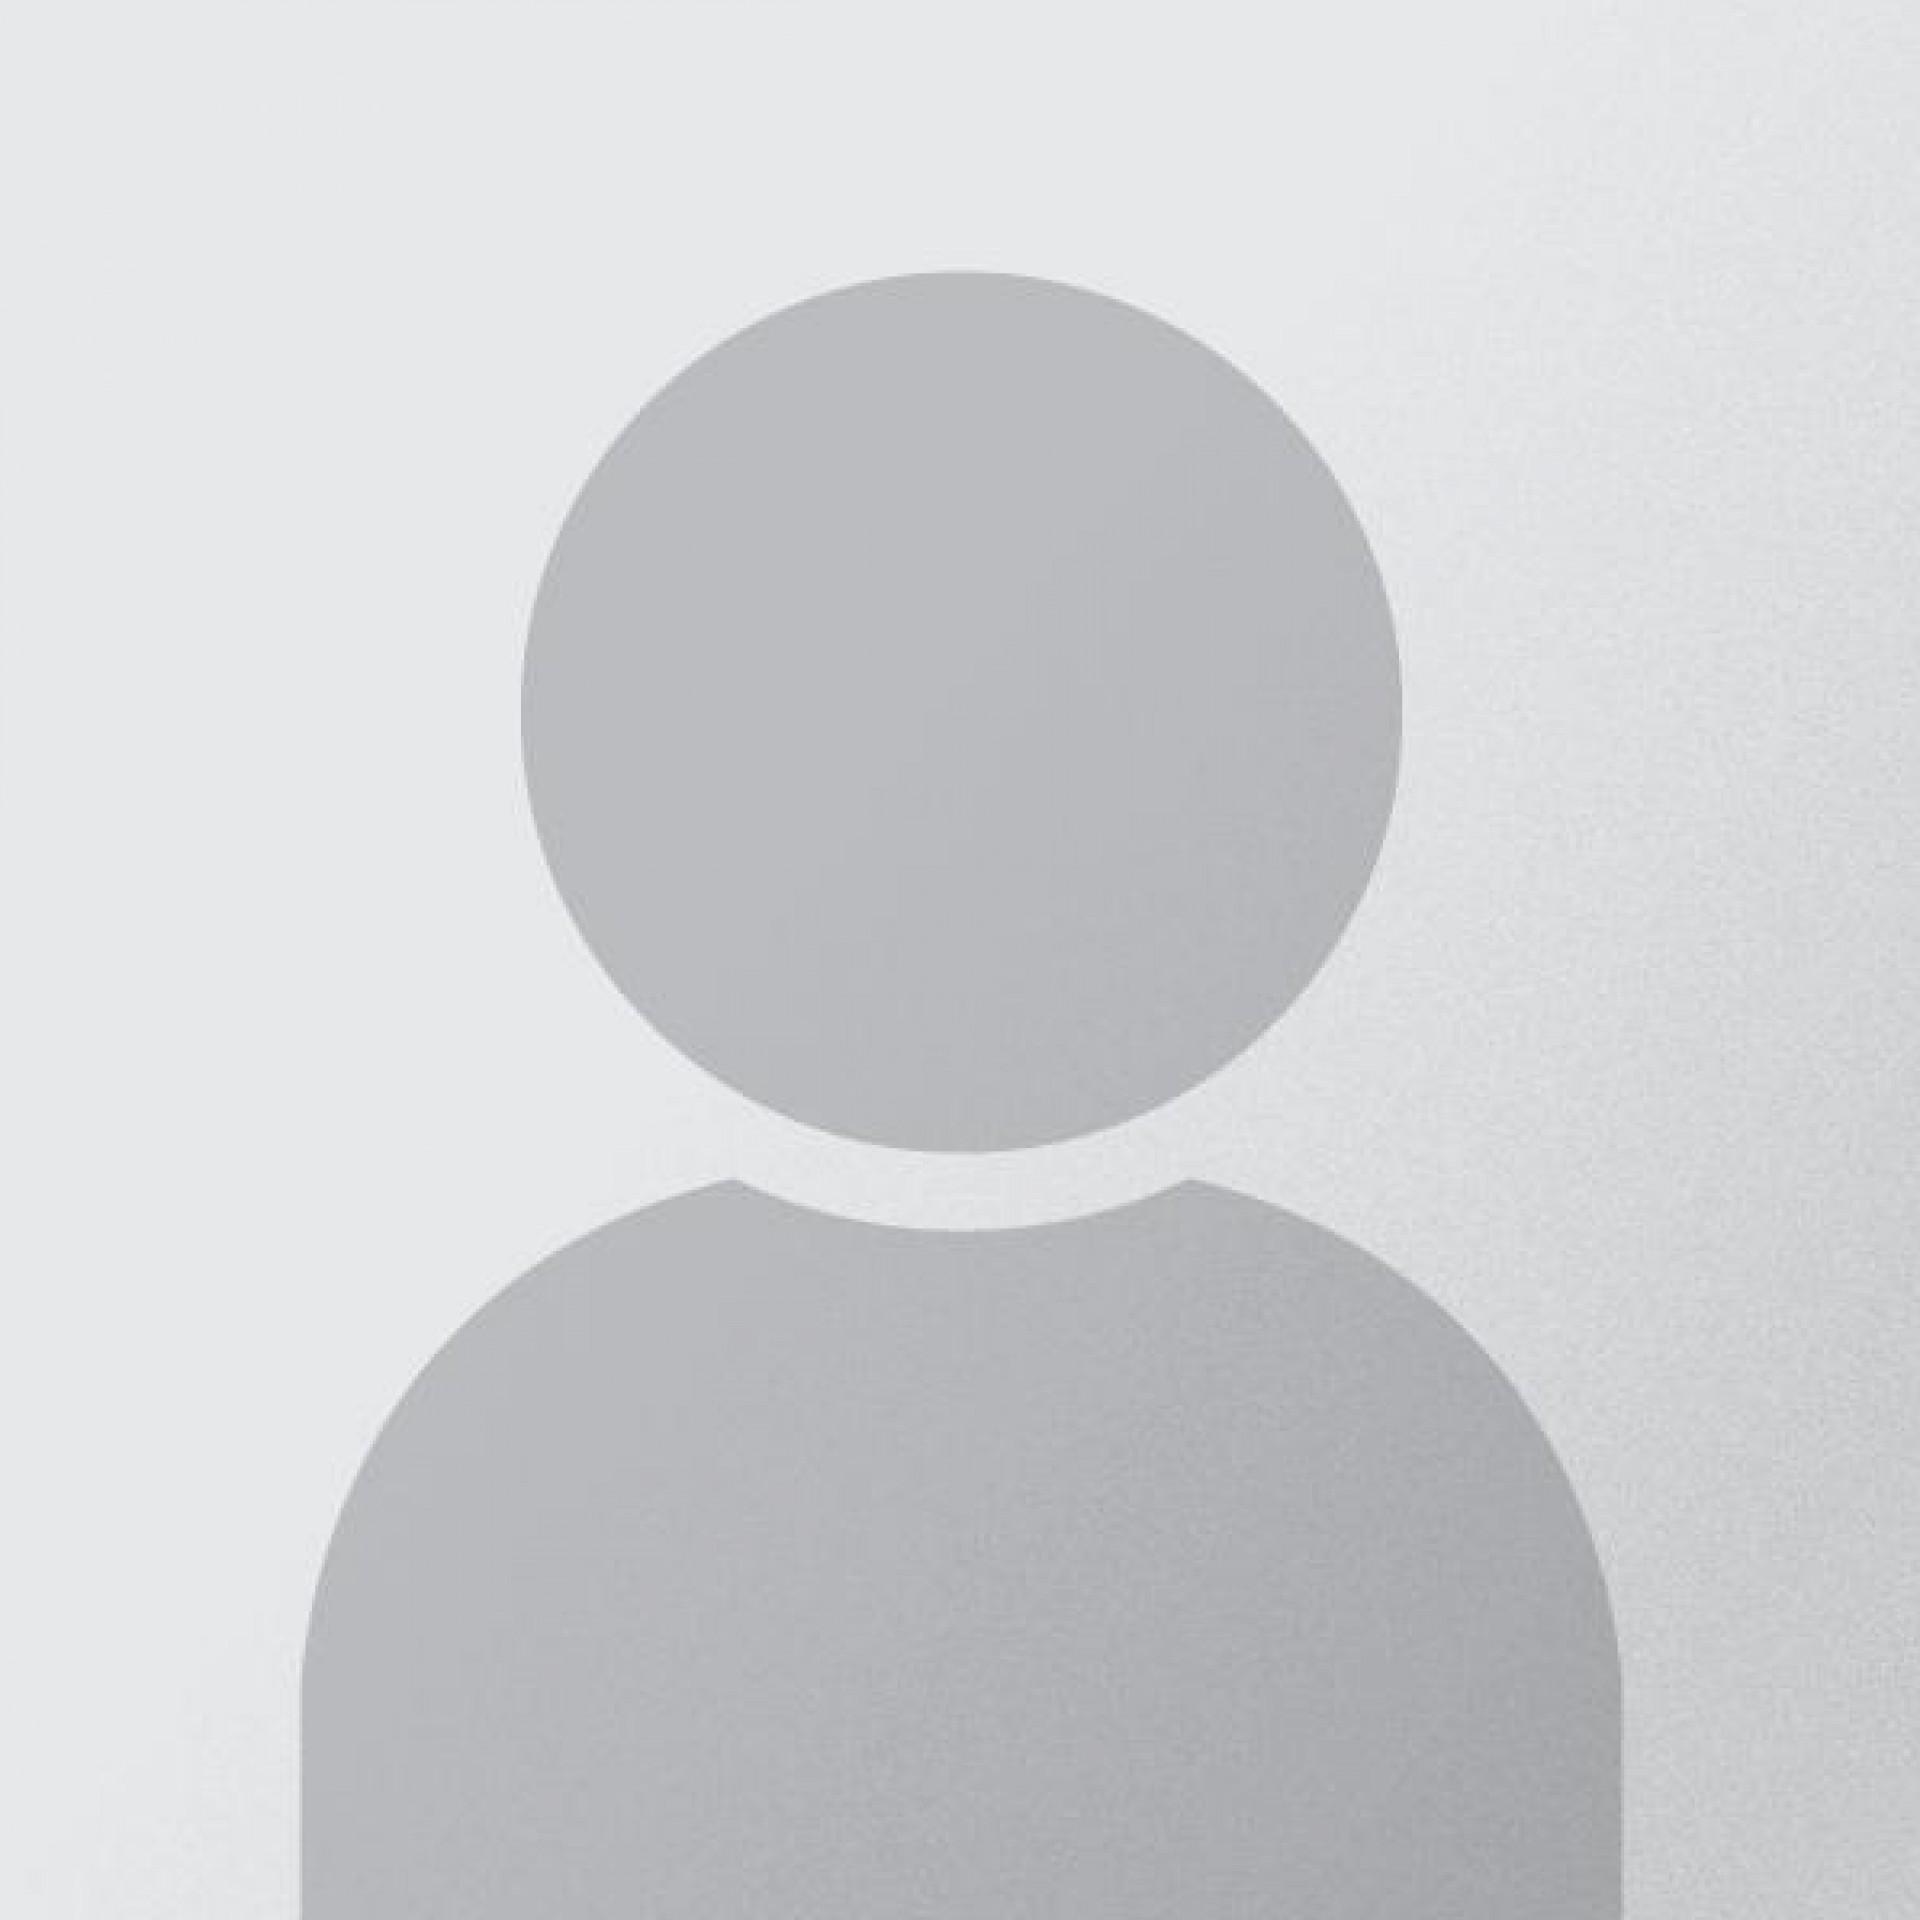 fotografia p021 profilu 0101QVLGRU